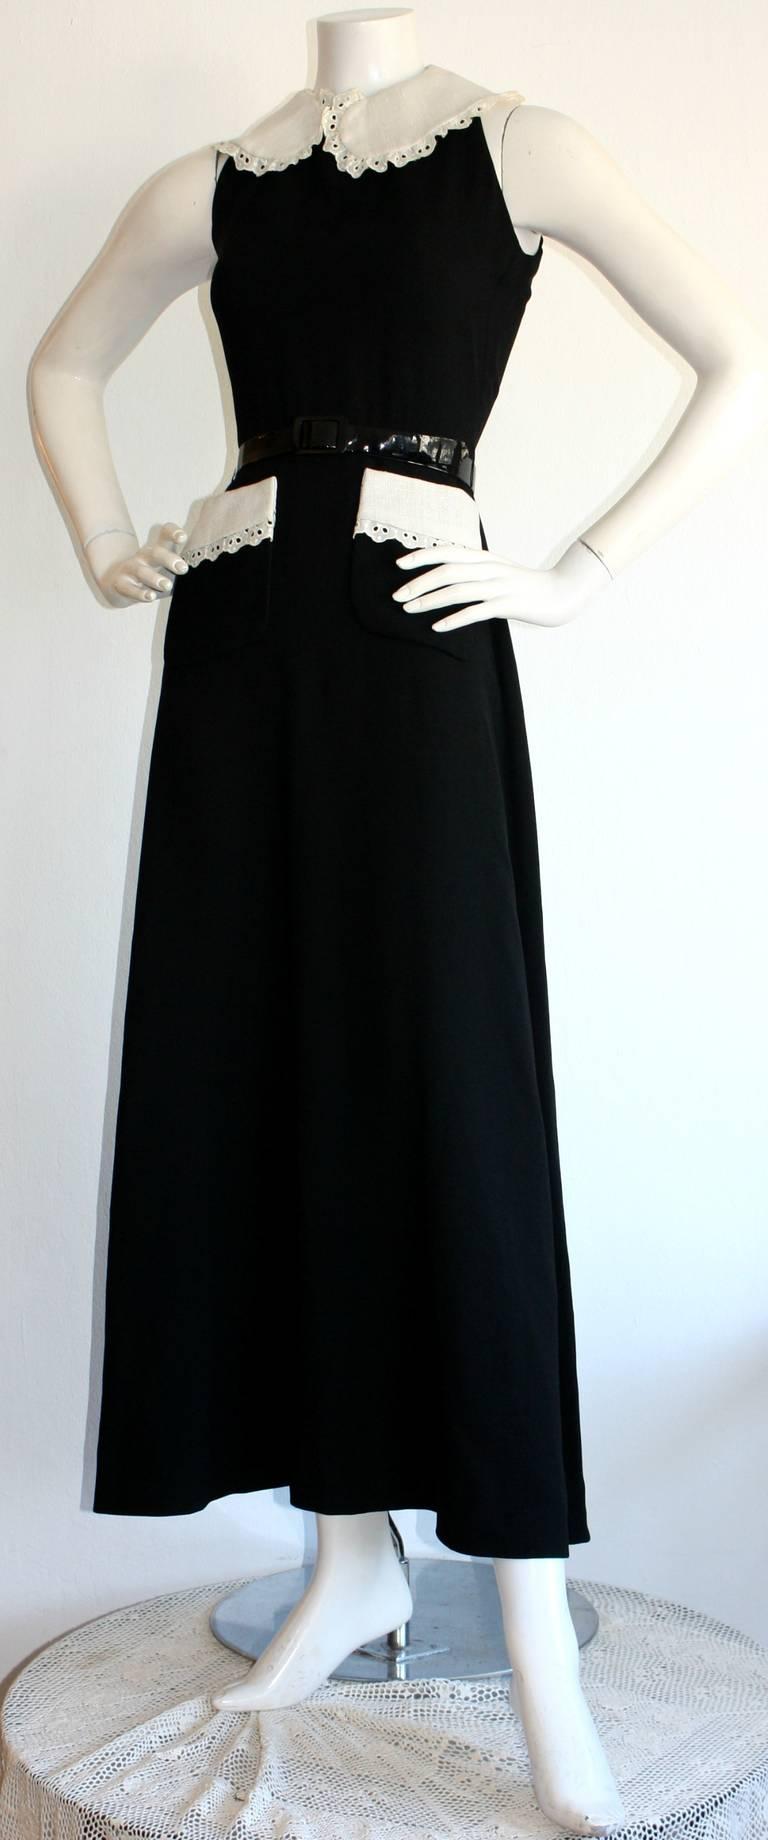 Donald Brooks Vintage Black & White Eyelet Belted Maxi Dress 2